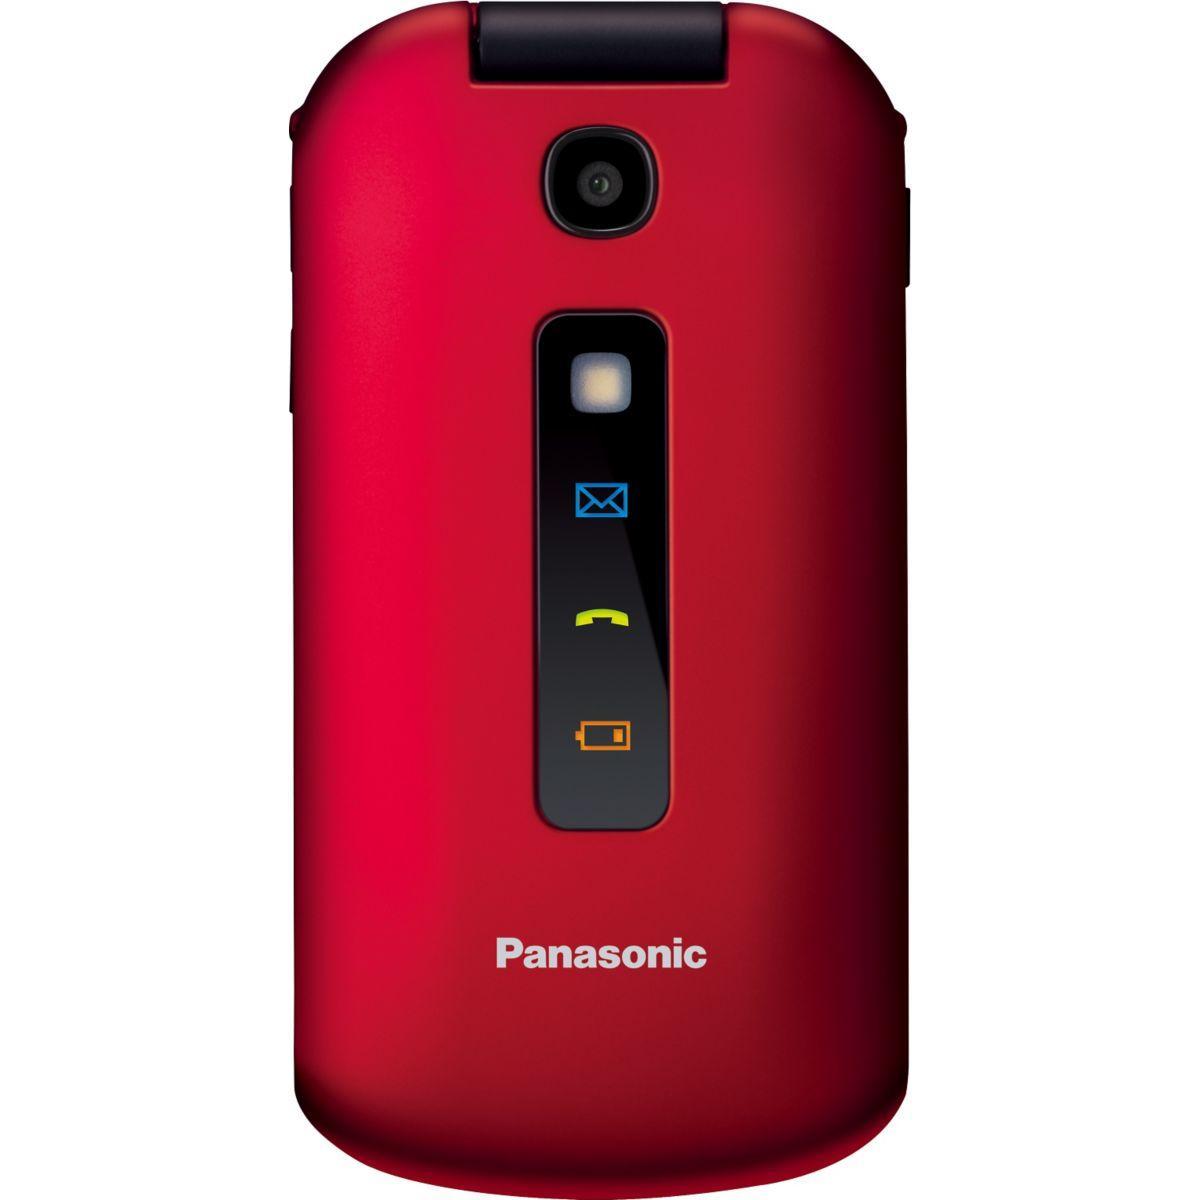 Mobile panasonic tu329 rouge - 2% de remise imm?diate avec le code : noel2